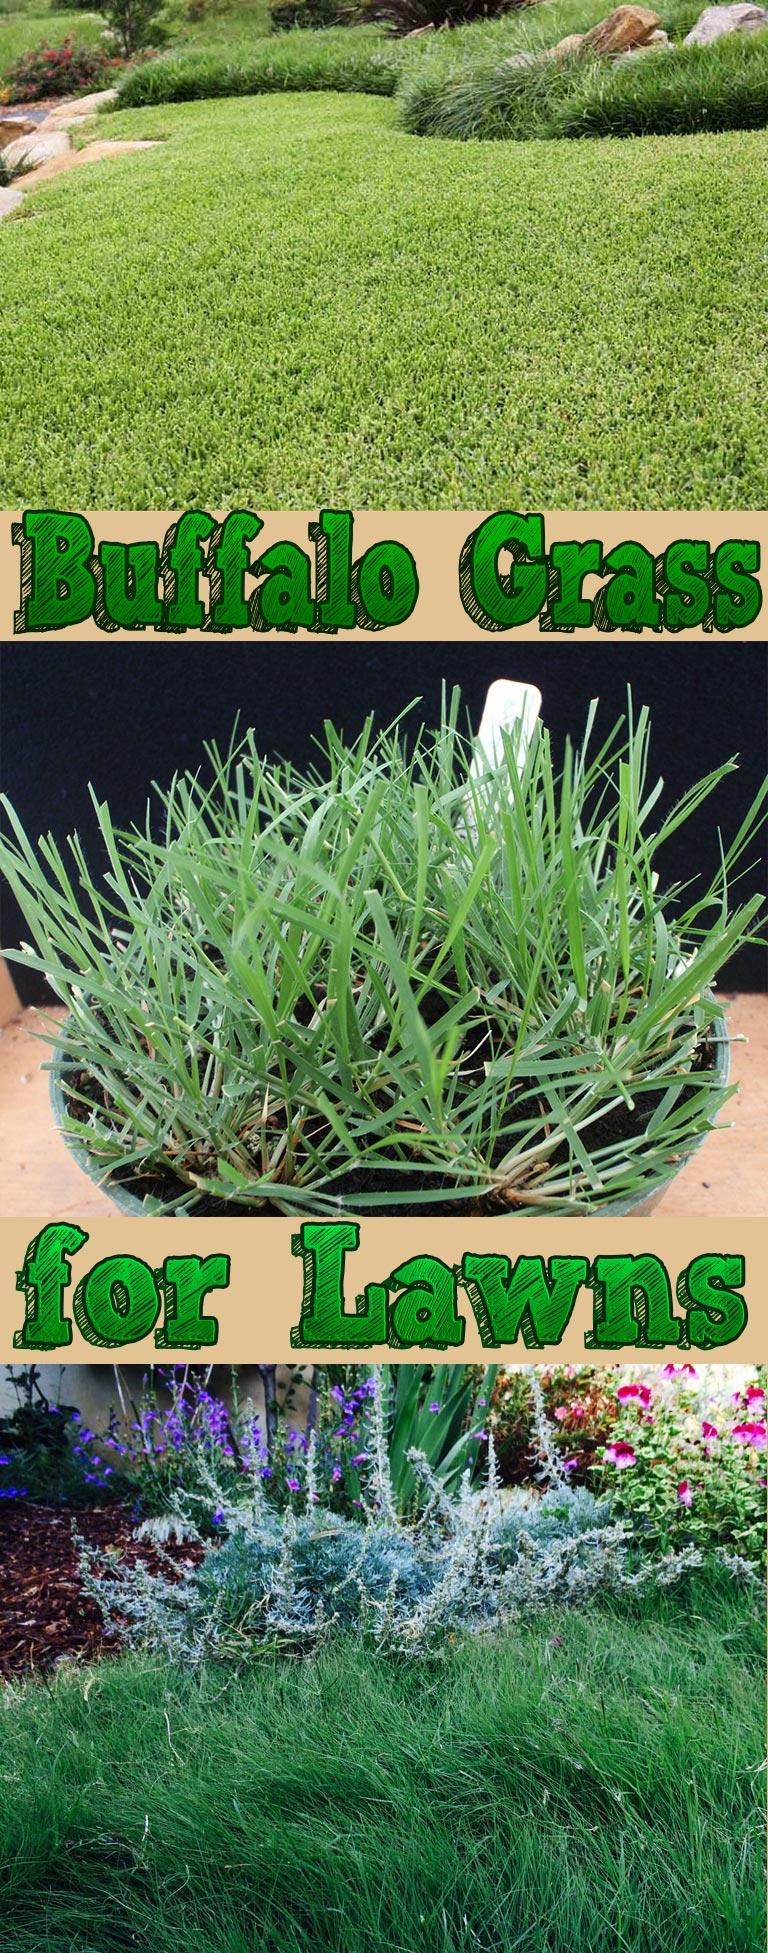 Buffalo Grass for Lawns